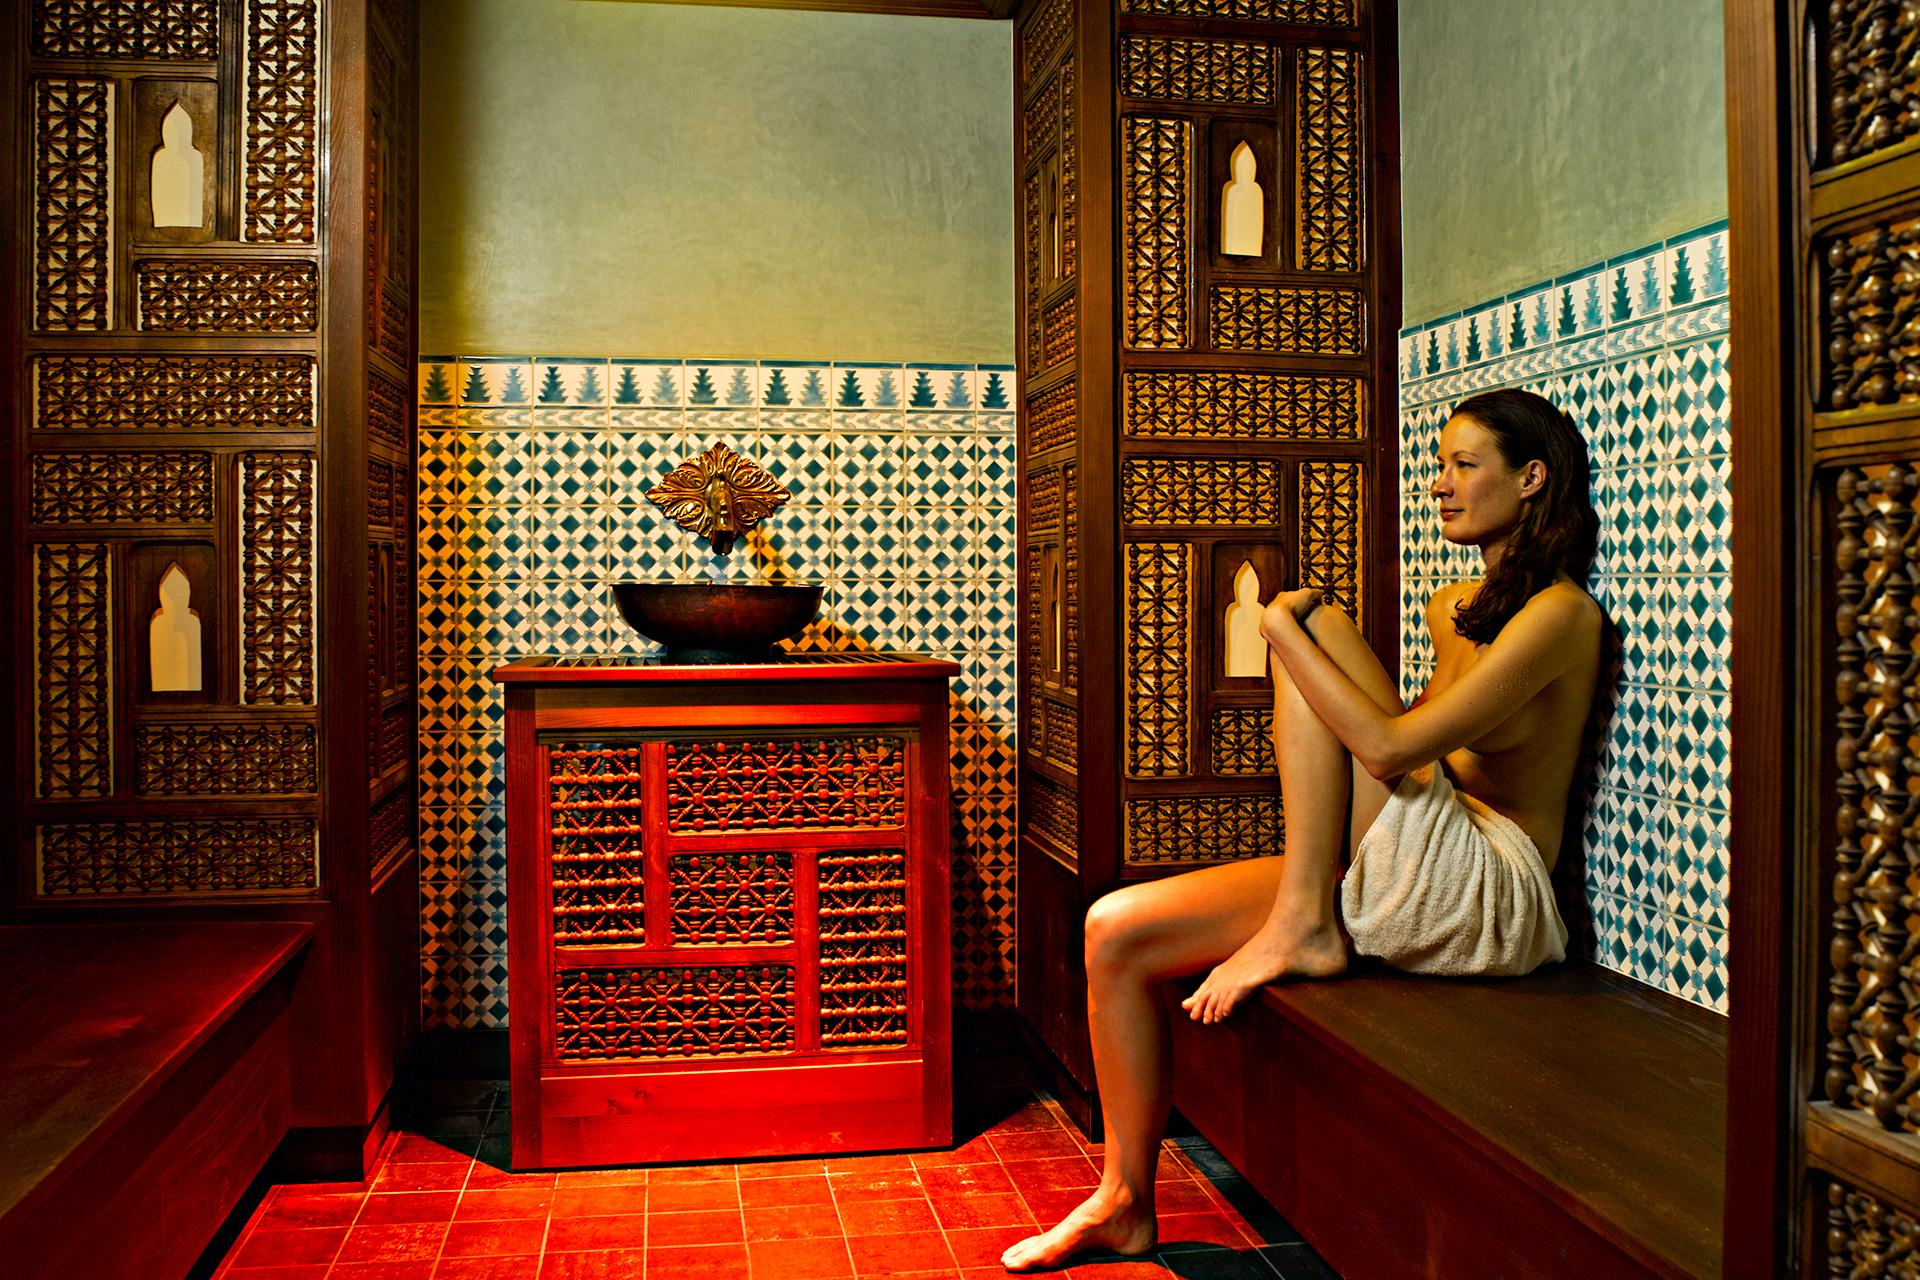 MOHR life resort - Wellness - Medical Spa&Welness